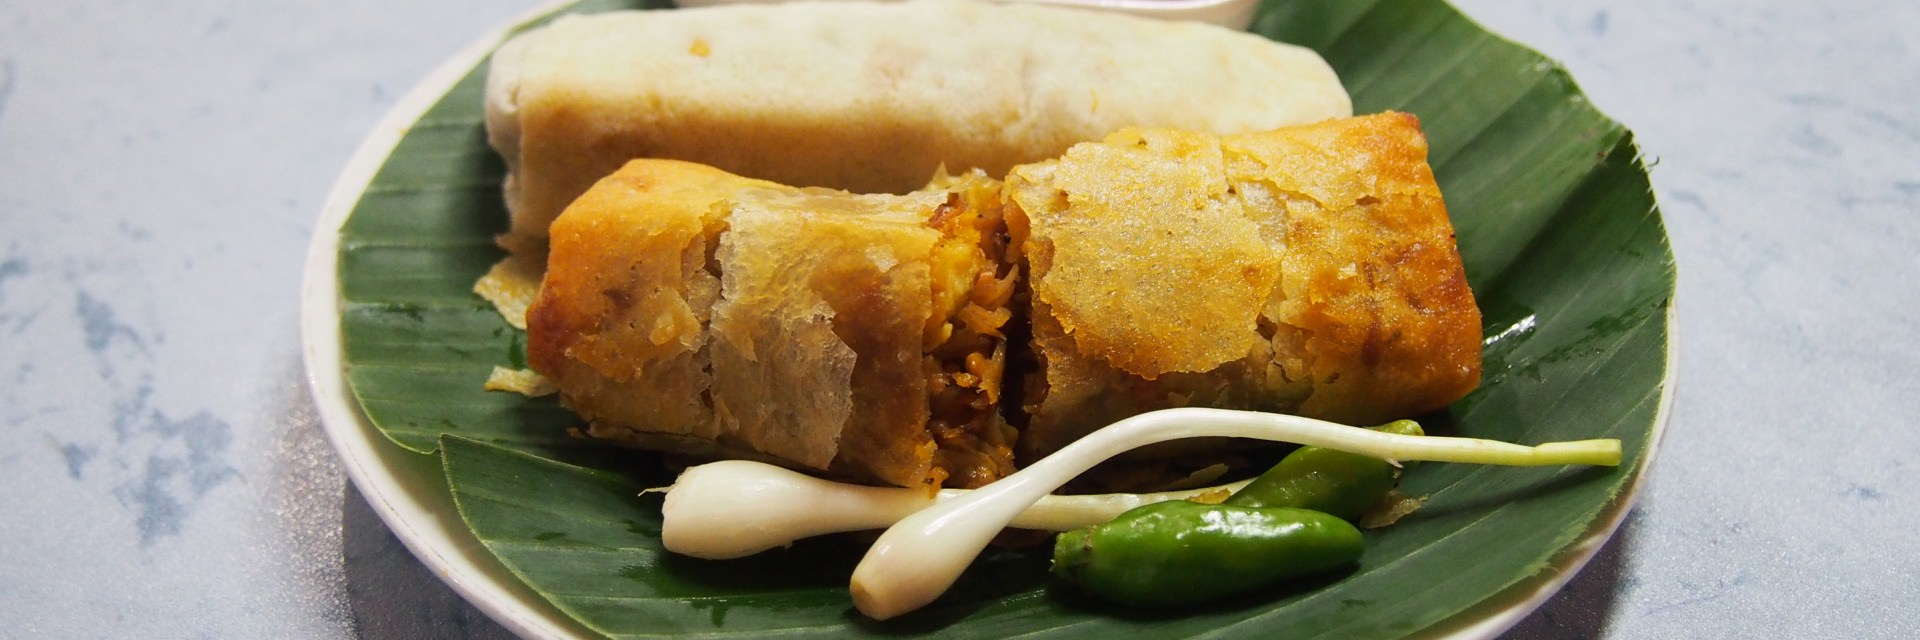 20 Tempat Kuliner di Semarang yang Terkenal Lezatnya 20 Tempat Kuliner di Semarang yang Terkenal Lezatnya - Dolan Dolen